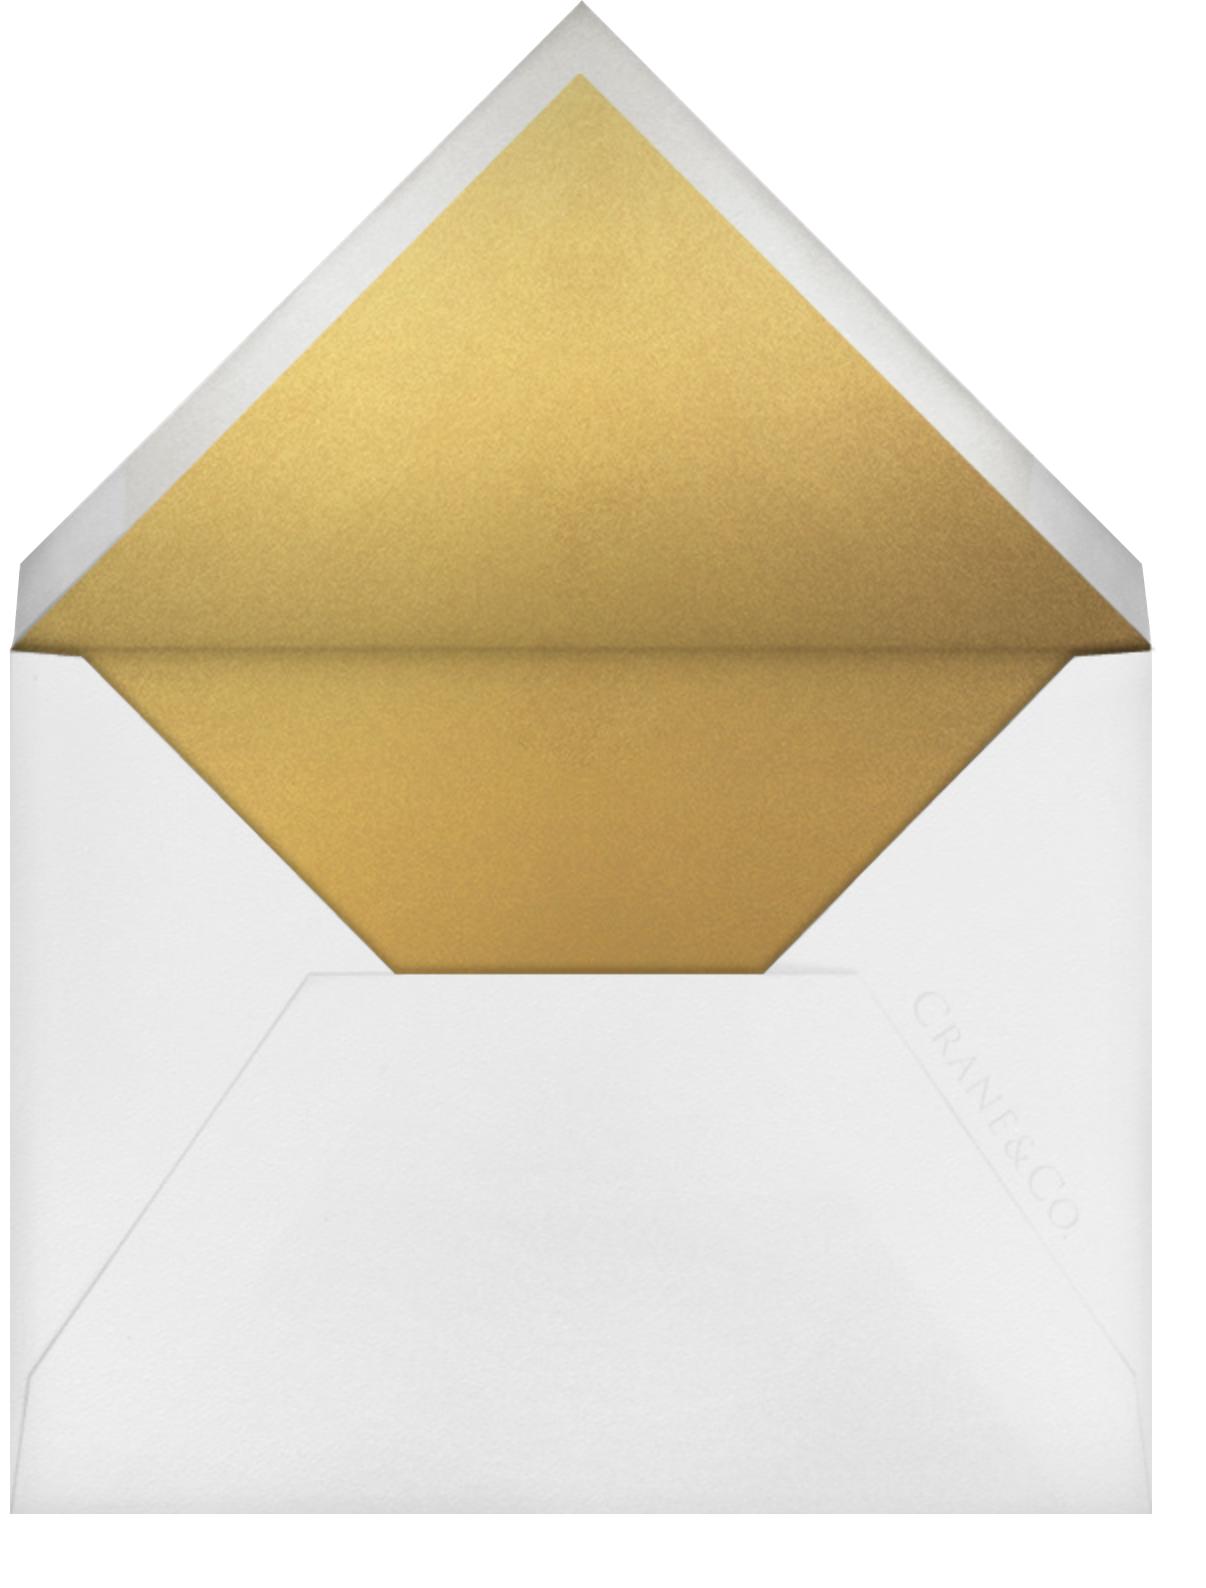 Abella - Crane & Co. - Personalized stationery - envelope back